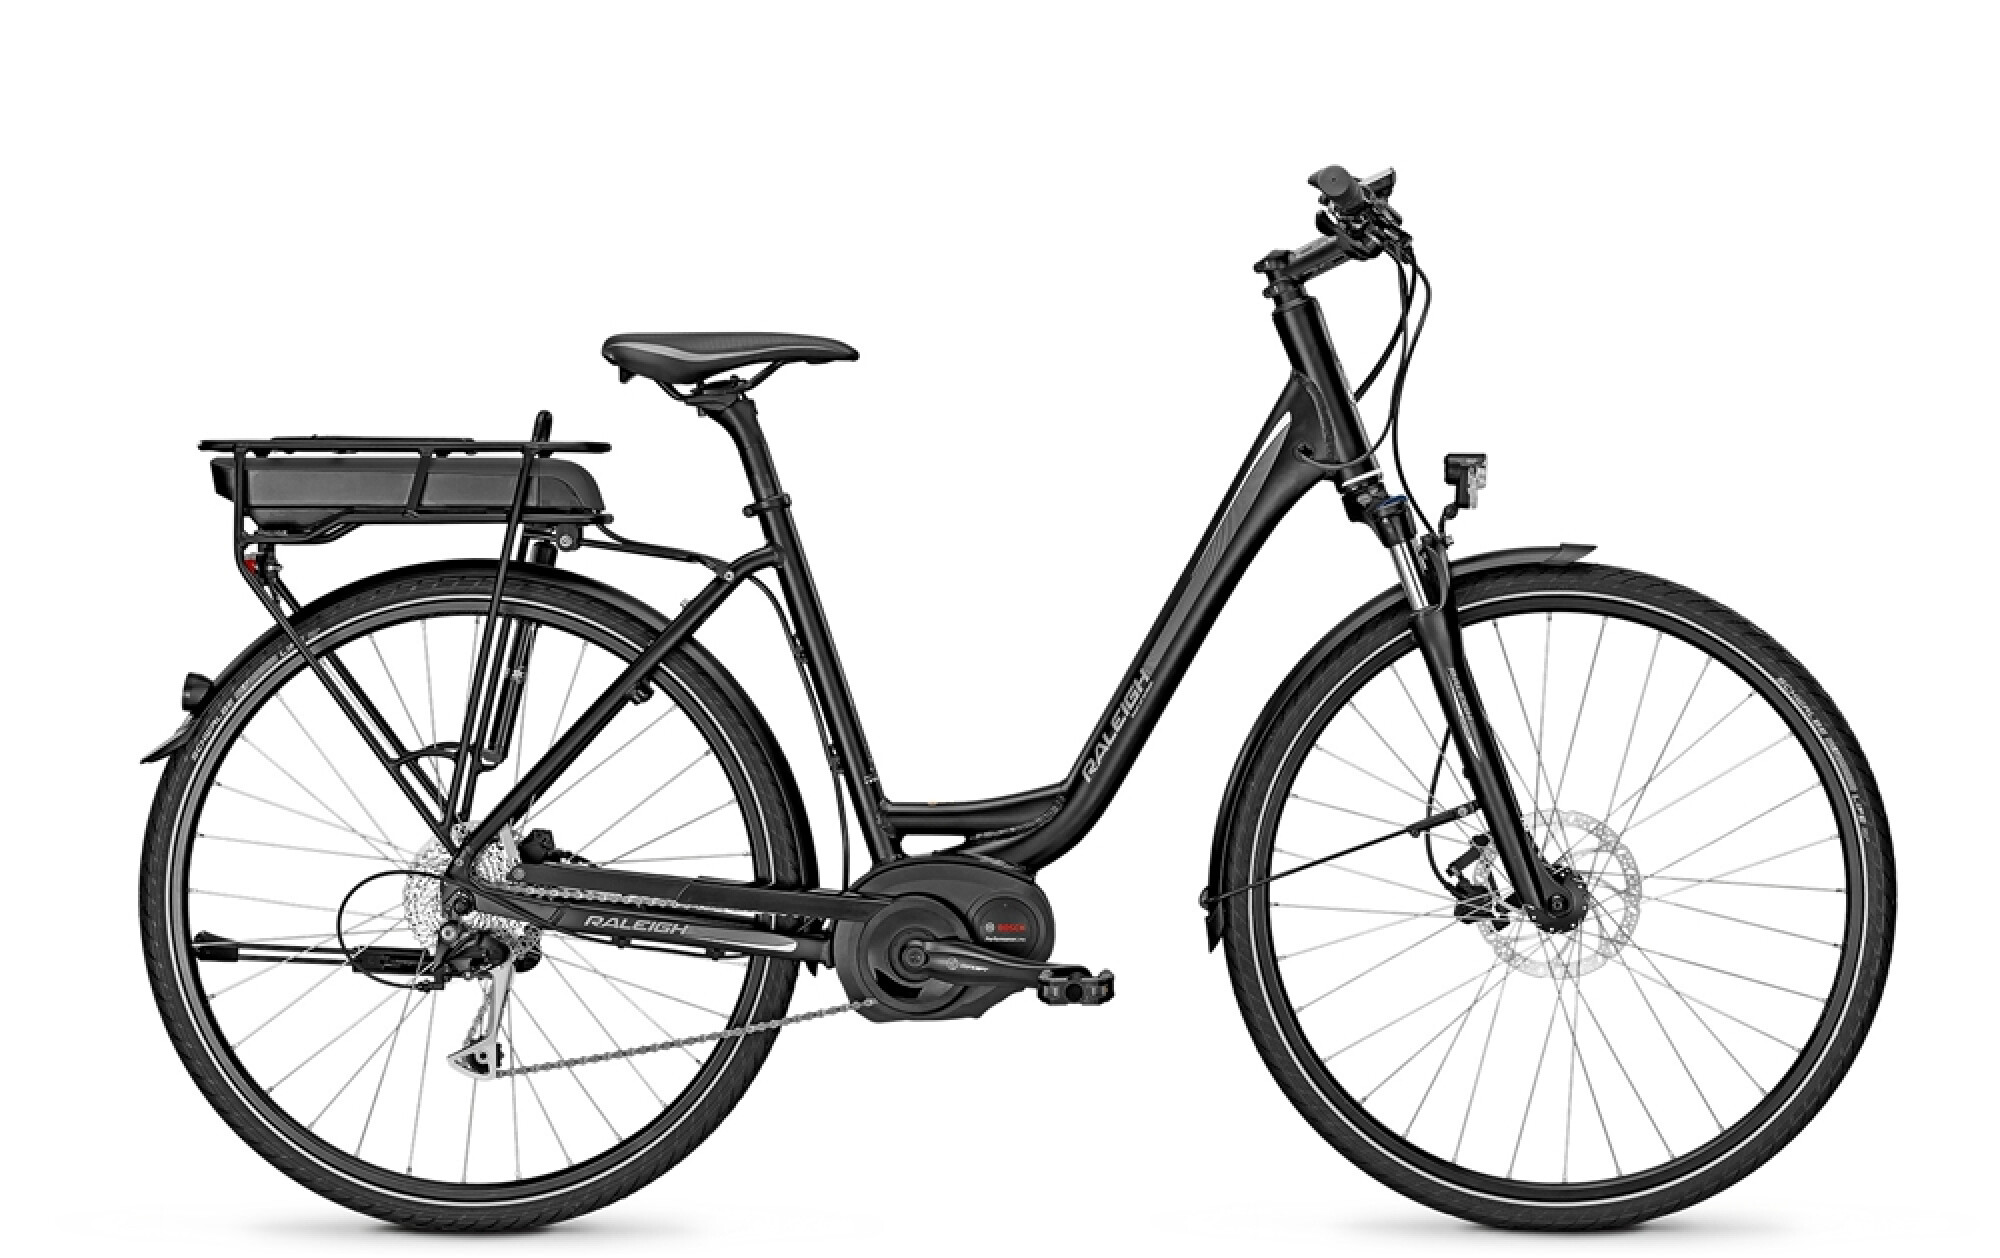 e bike raleigh stoker b9 2016 bei alle. Black Bedroom Furniture Sets. Home Design Ideas